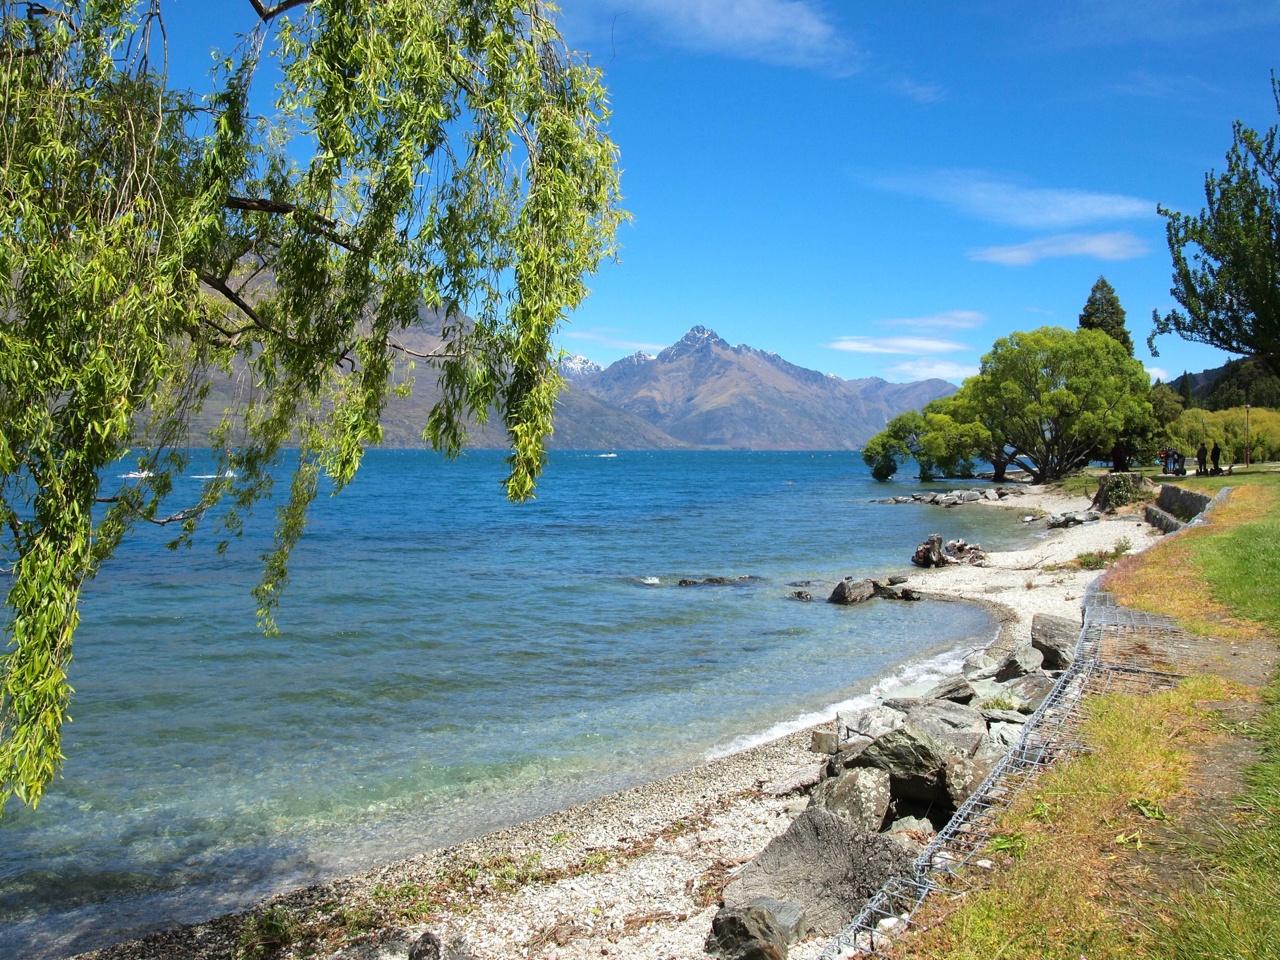 Lake Wakatipu in Queenstown, New Zealand